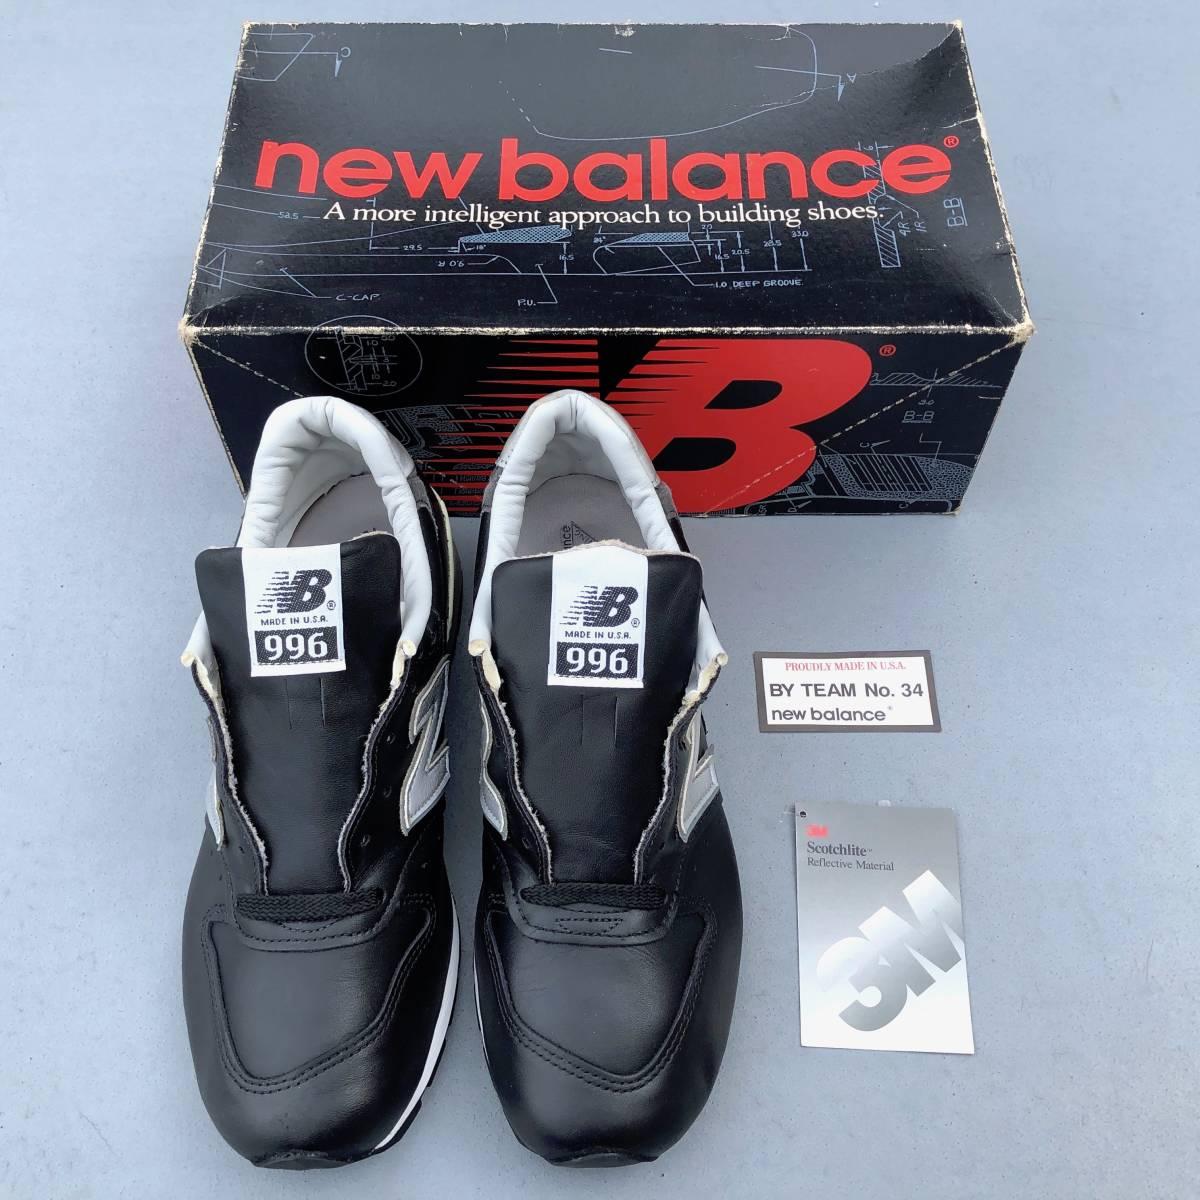 NB公式リペア済 デッドストック 90s USA製 NEW BALANCE M996LB US8D 26cm オールレザー ビンテージ 新品 アメリカ米国製 ブラック×グレー_画像1